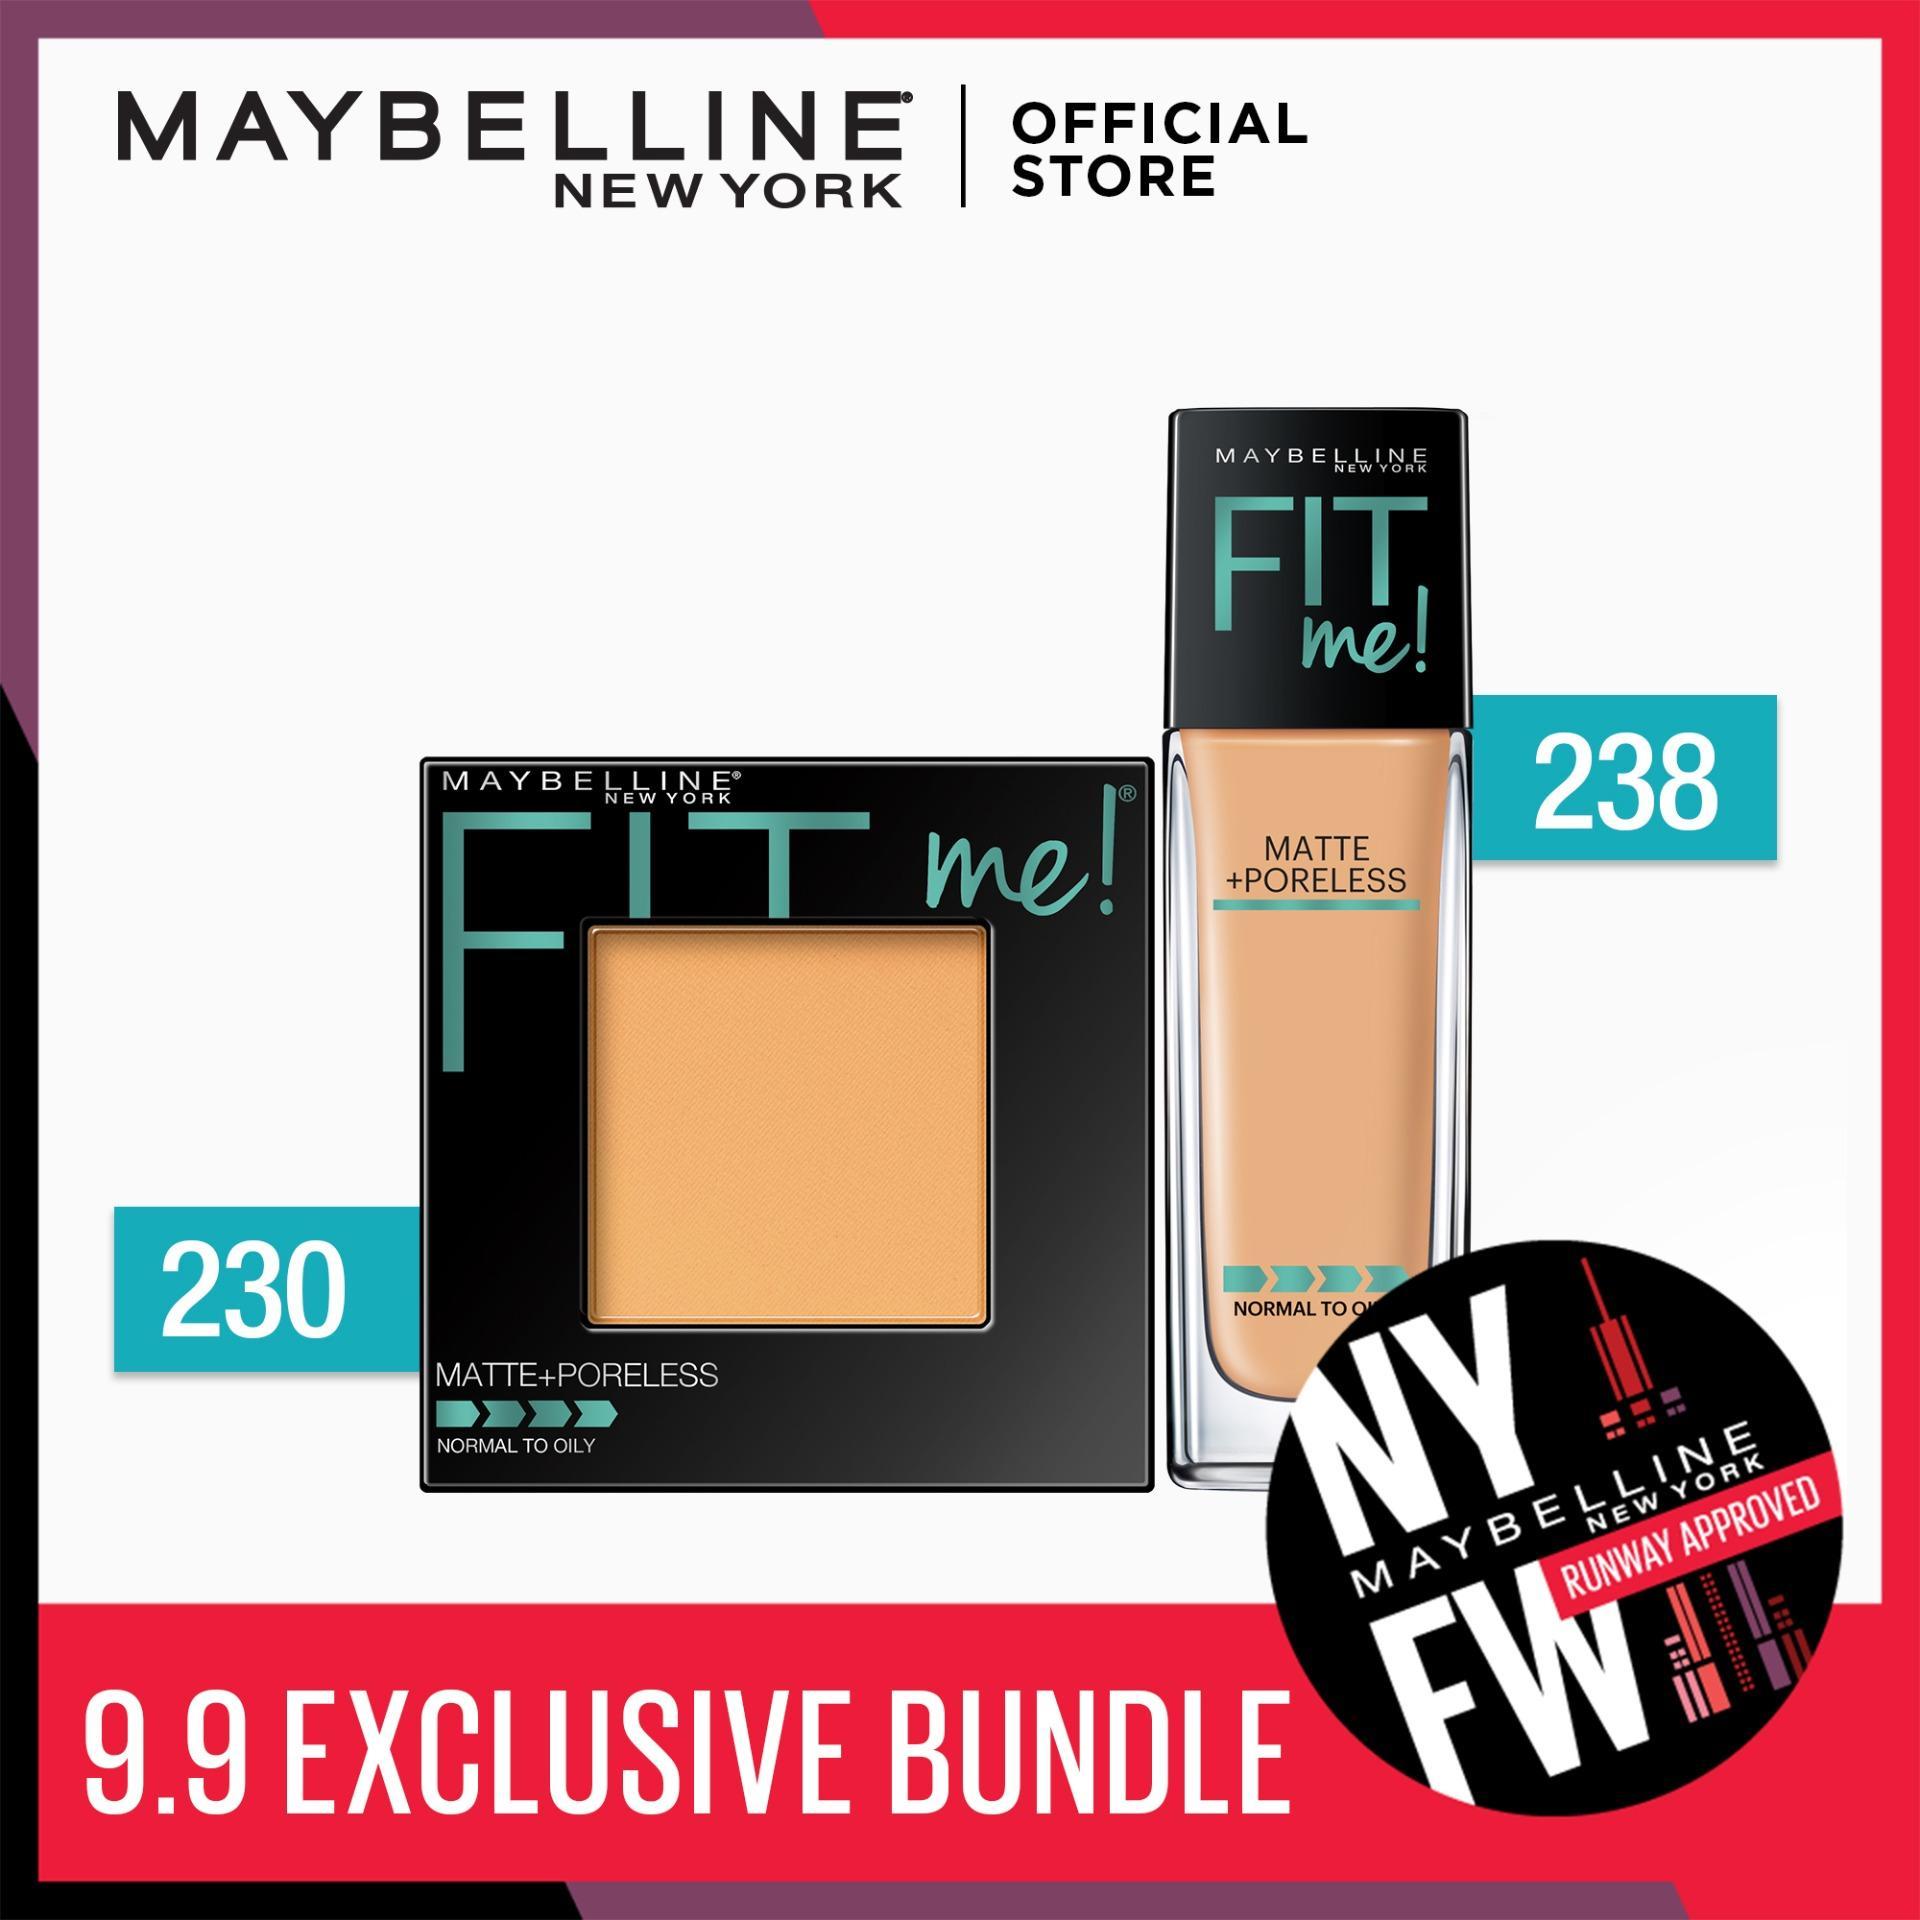 Maybelline Fit Me Foundation 238 Rich Tan + Fit Me Powder 230 Nat Buff [EXCLUSIVE BUNDLE] Philippines